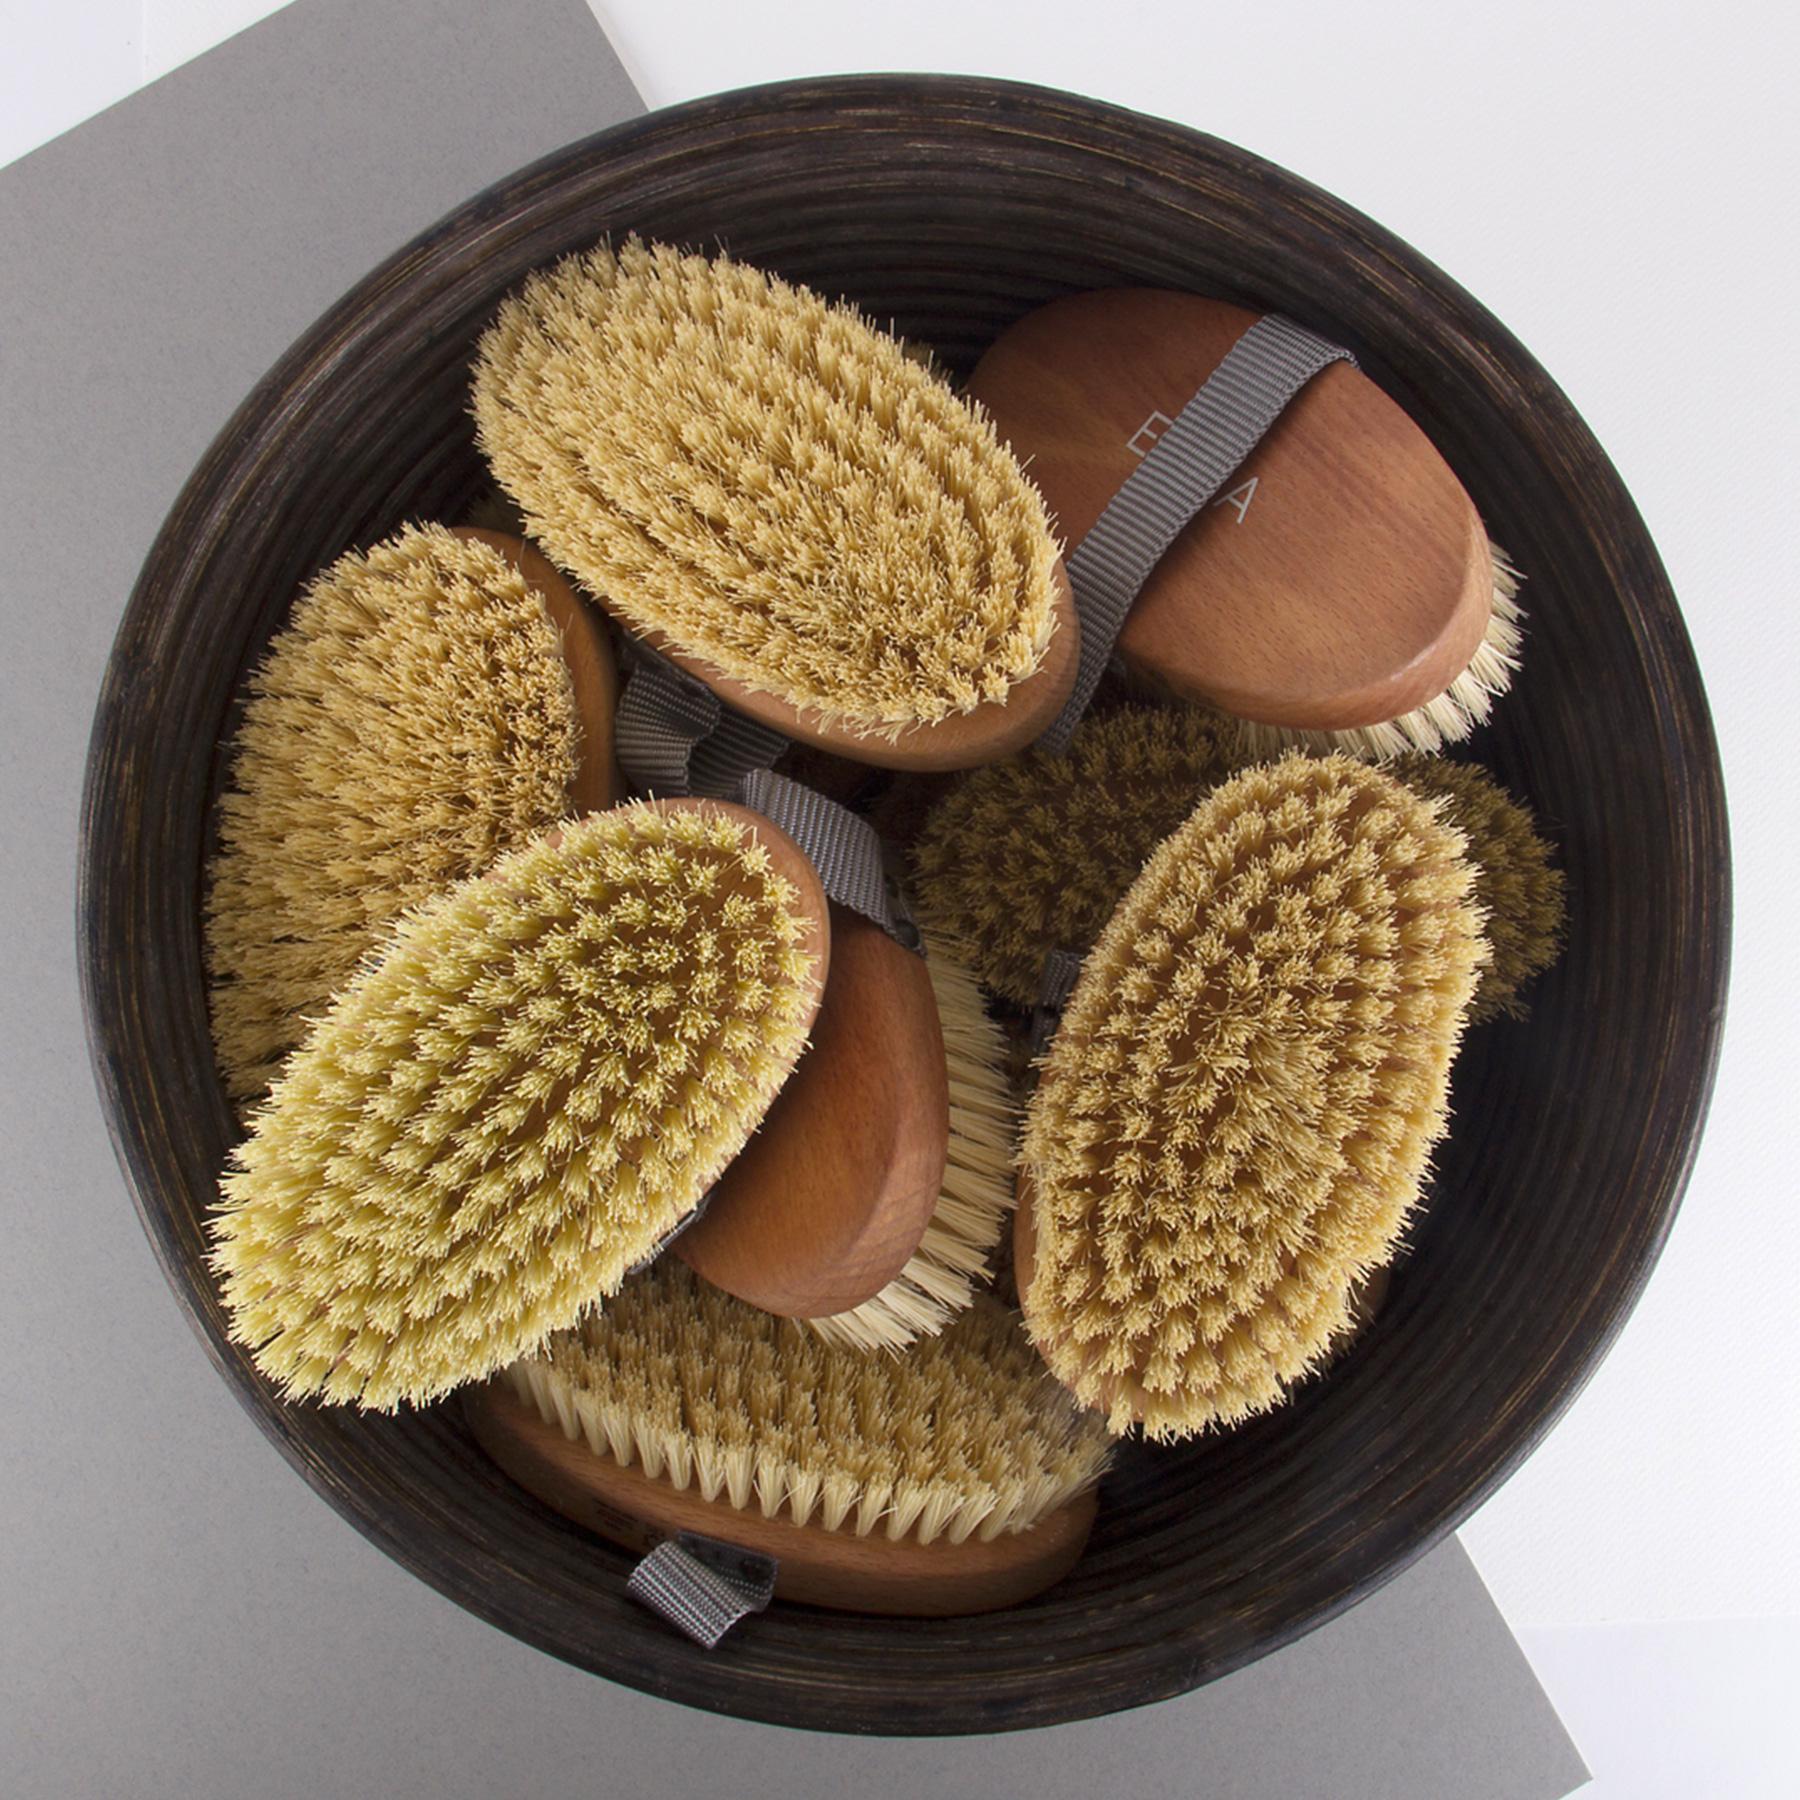 ESPA Skincare Skin Brushes